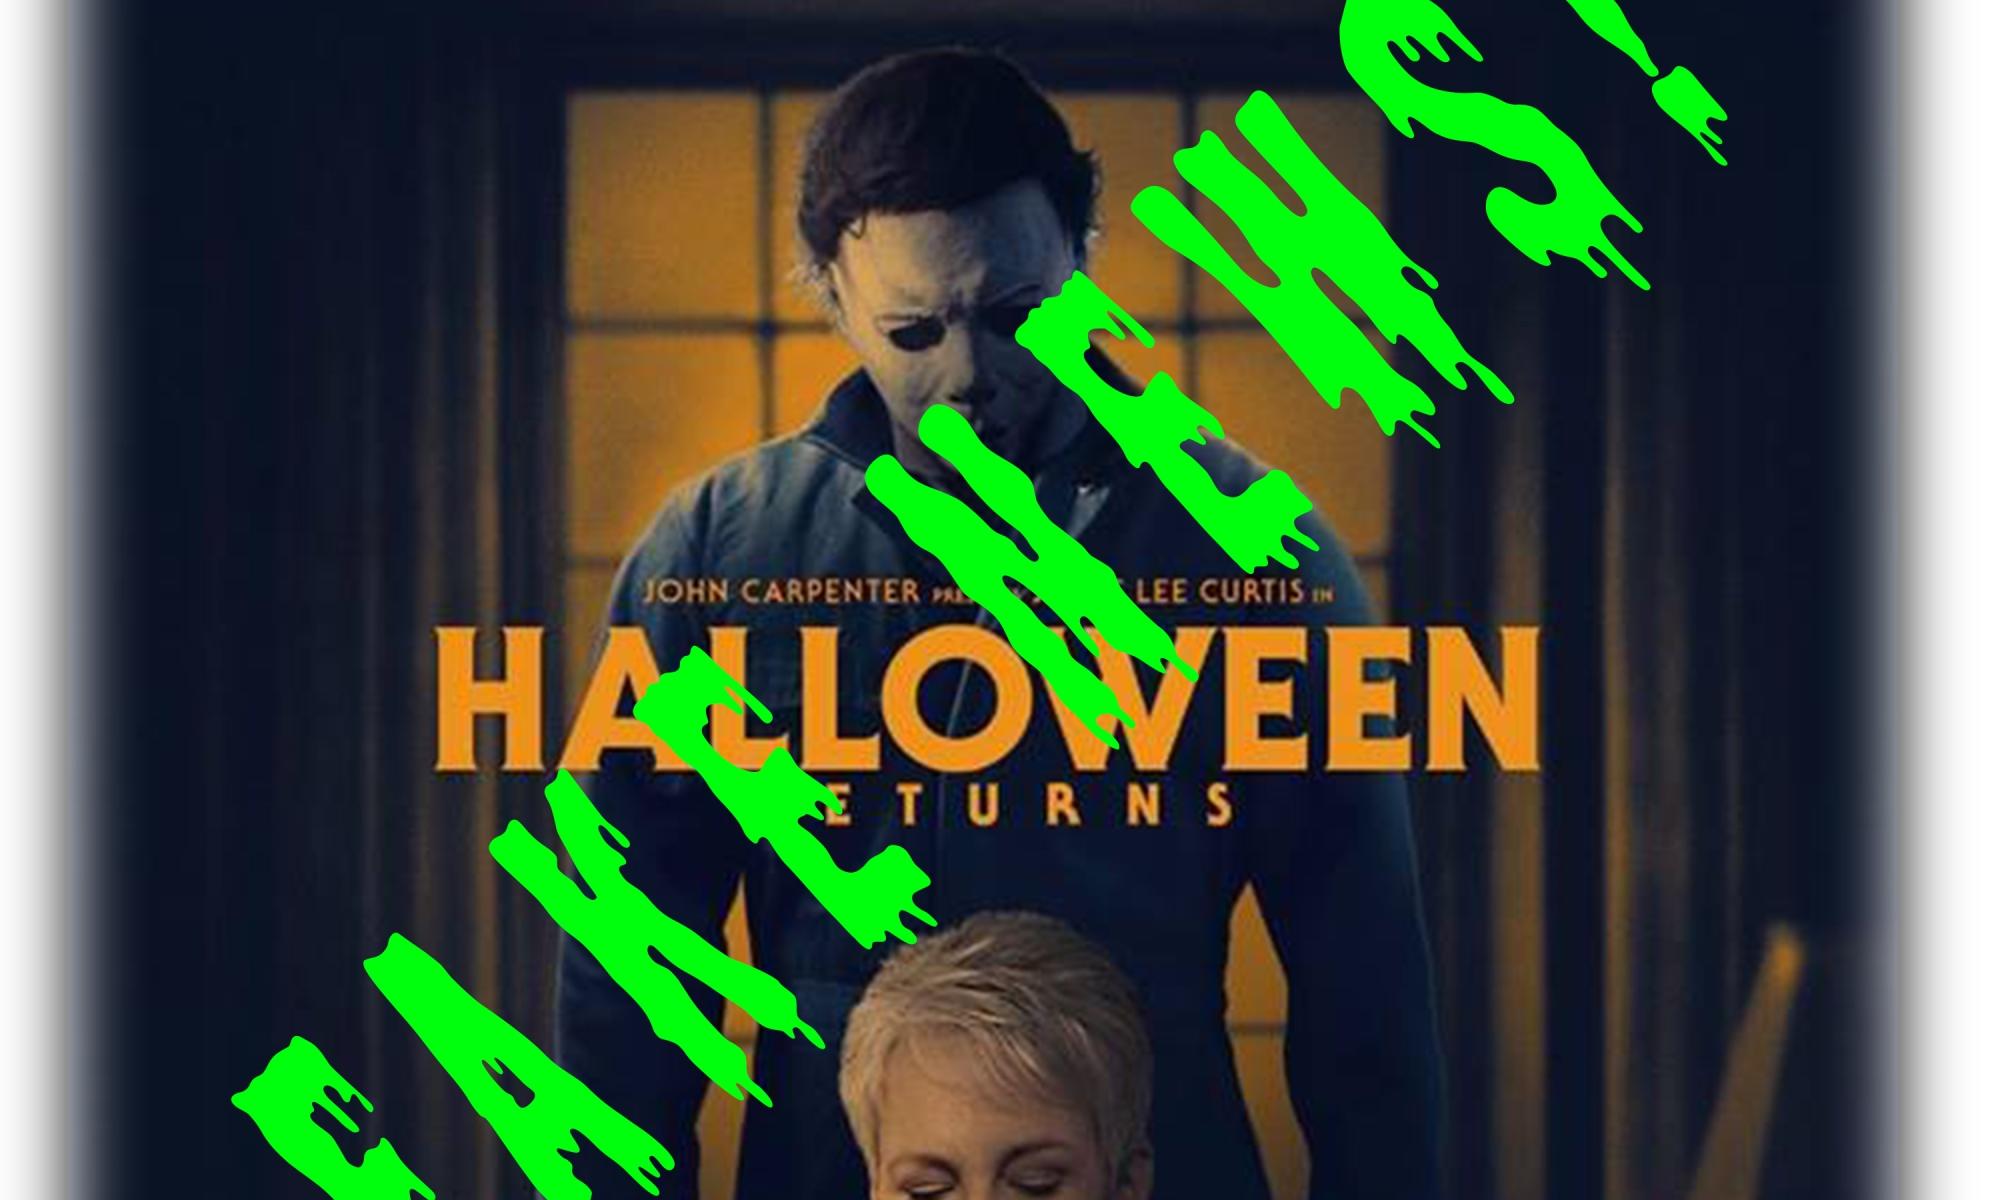 horror, fake news, halloween, it, scary basement media